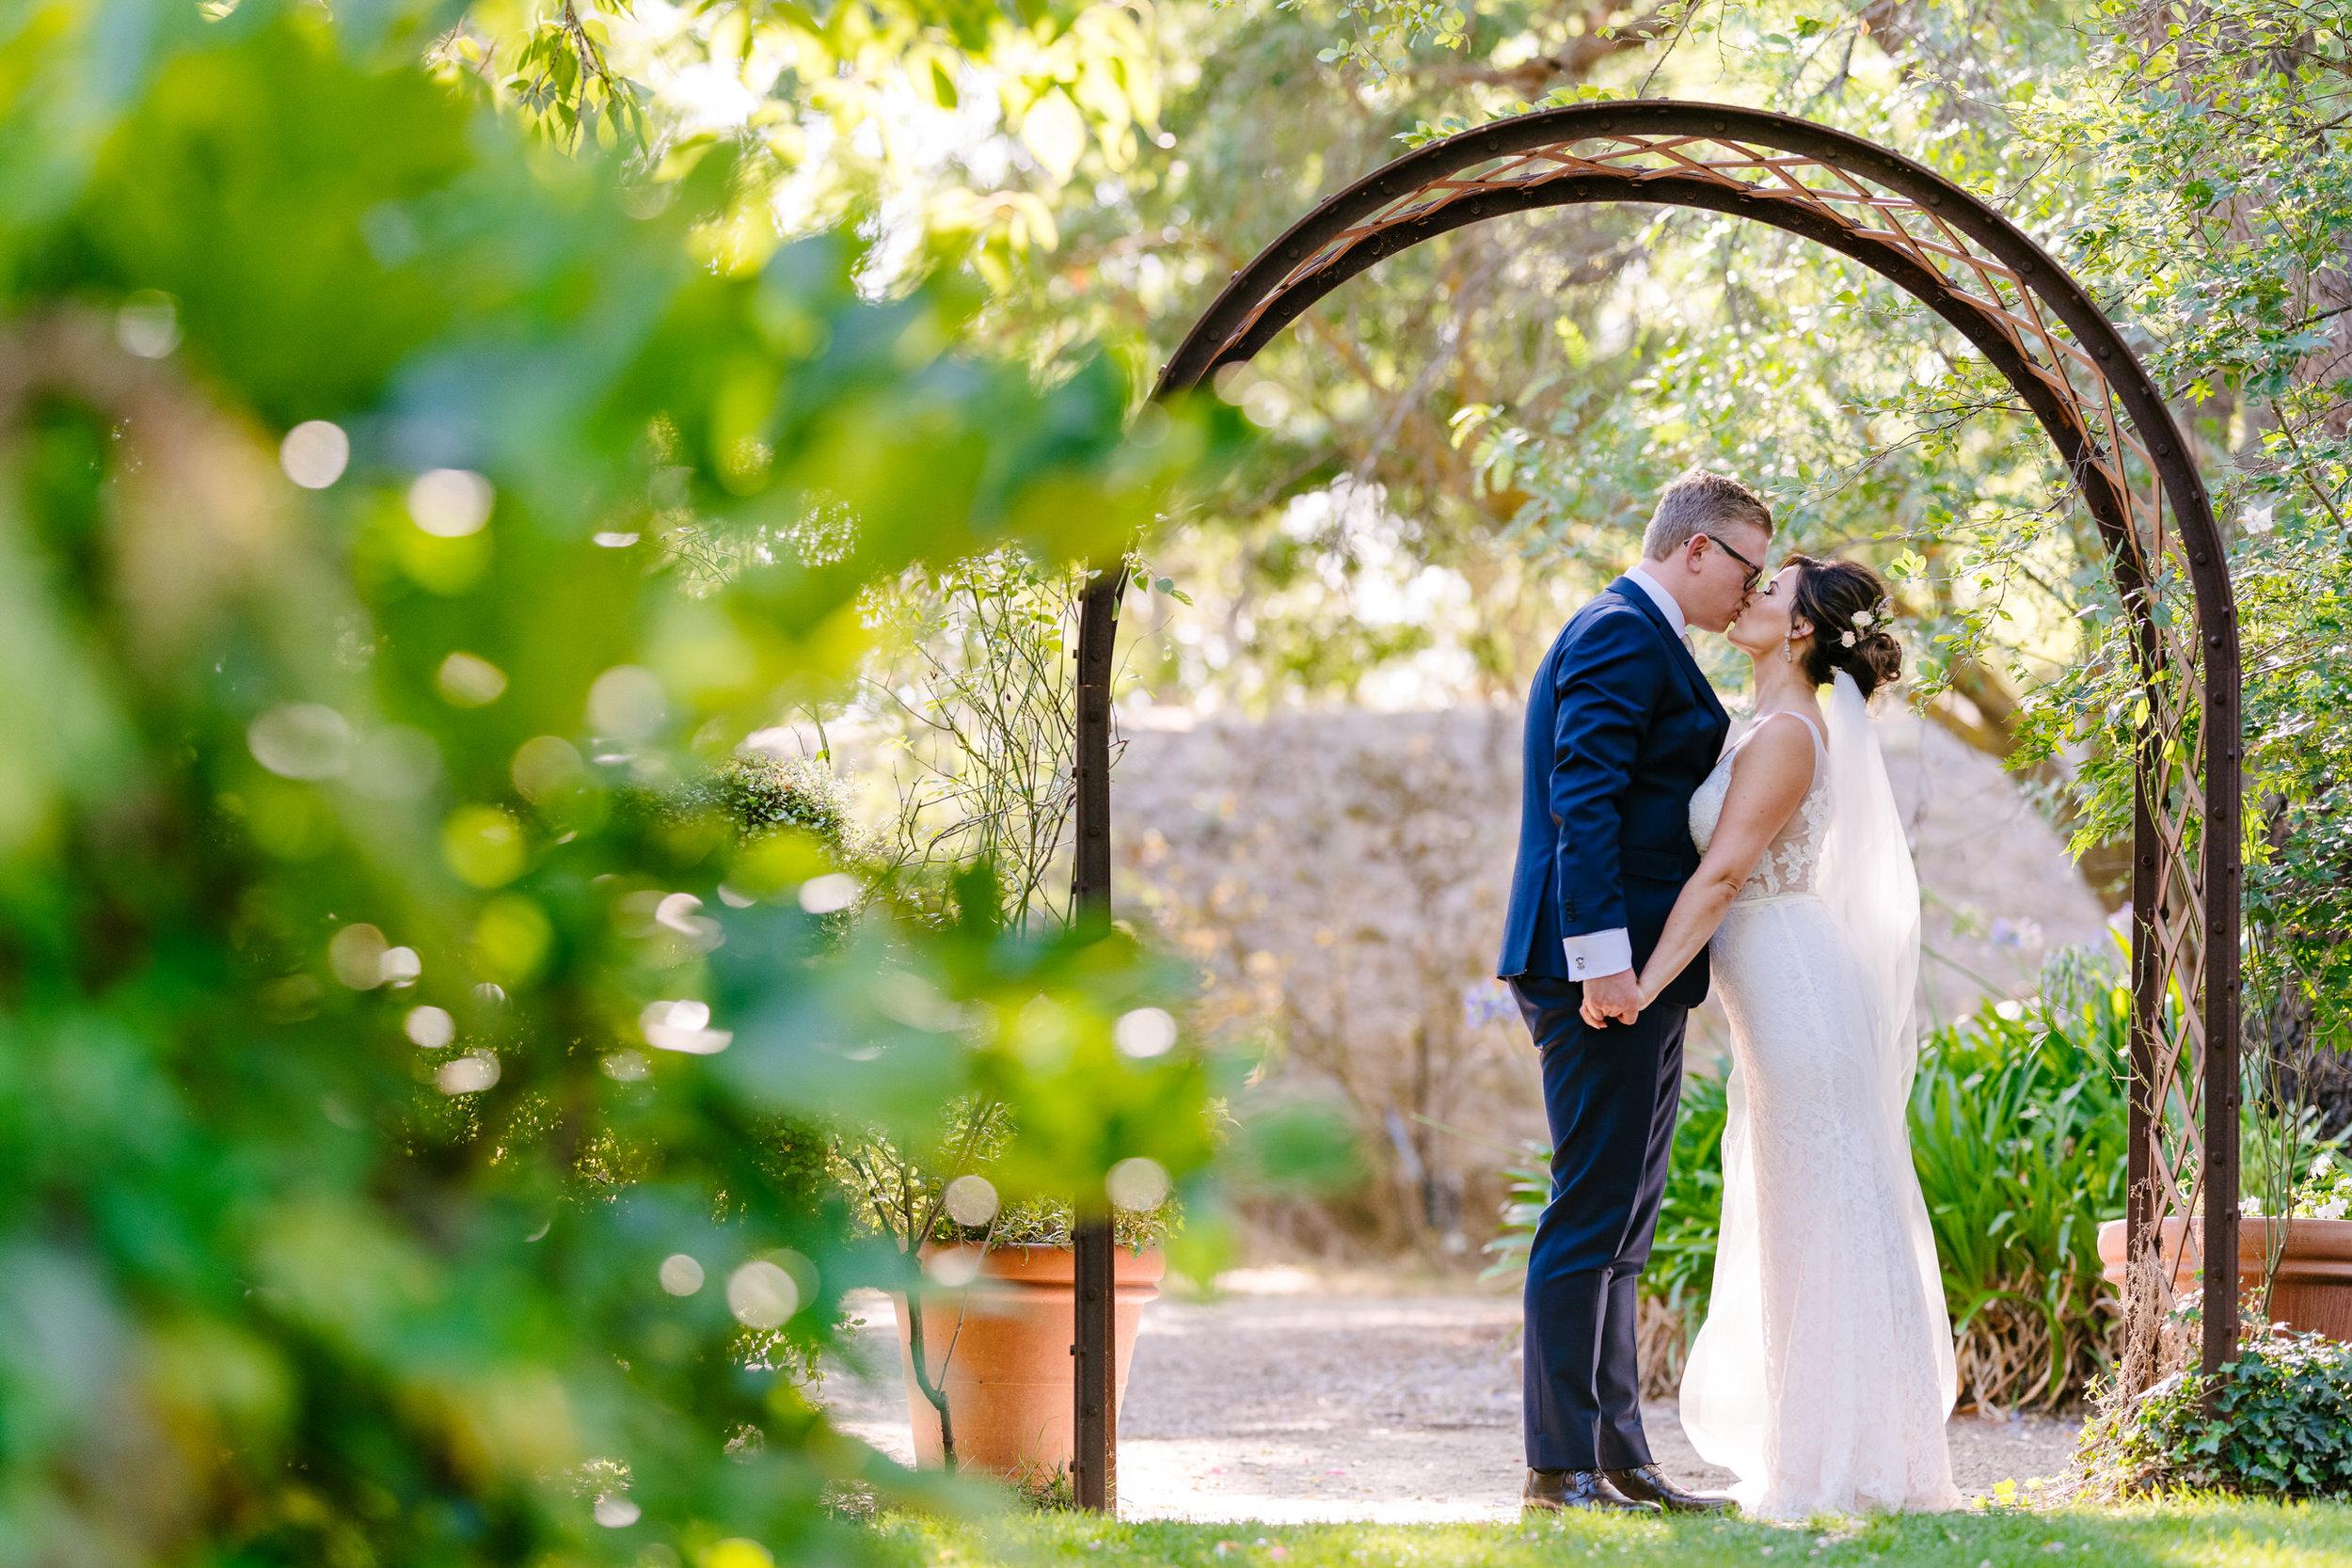 Justin_And_Jim_Photography_Chateau_Dore_Bendigo_Wedding58.JPG